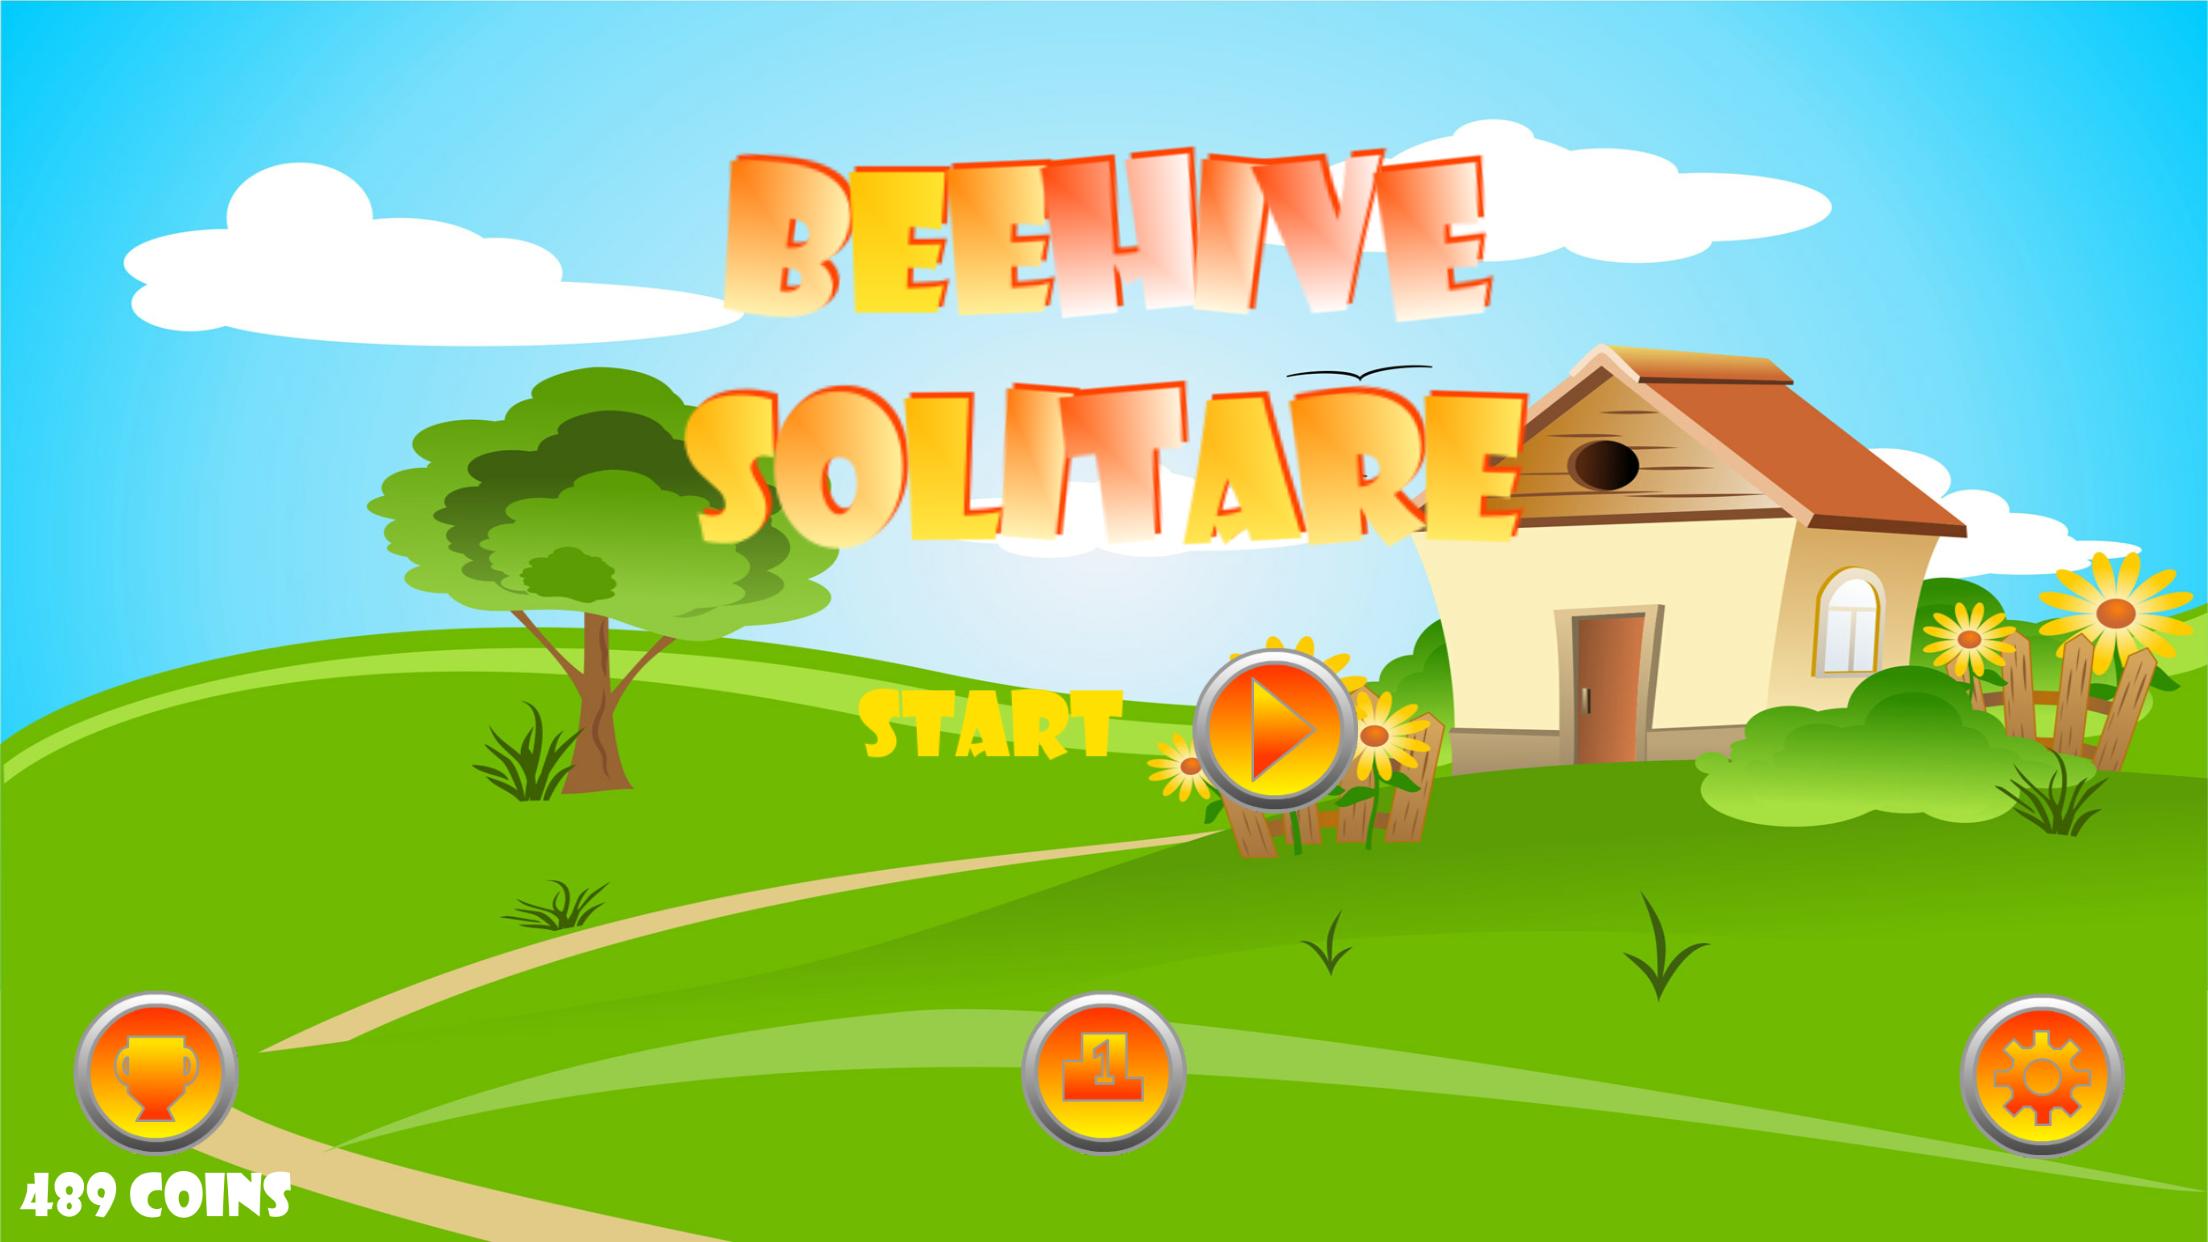 Beehive Solitare screenshot 1